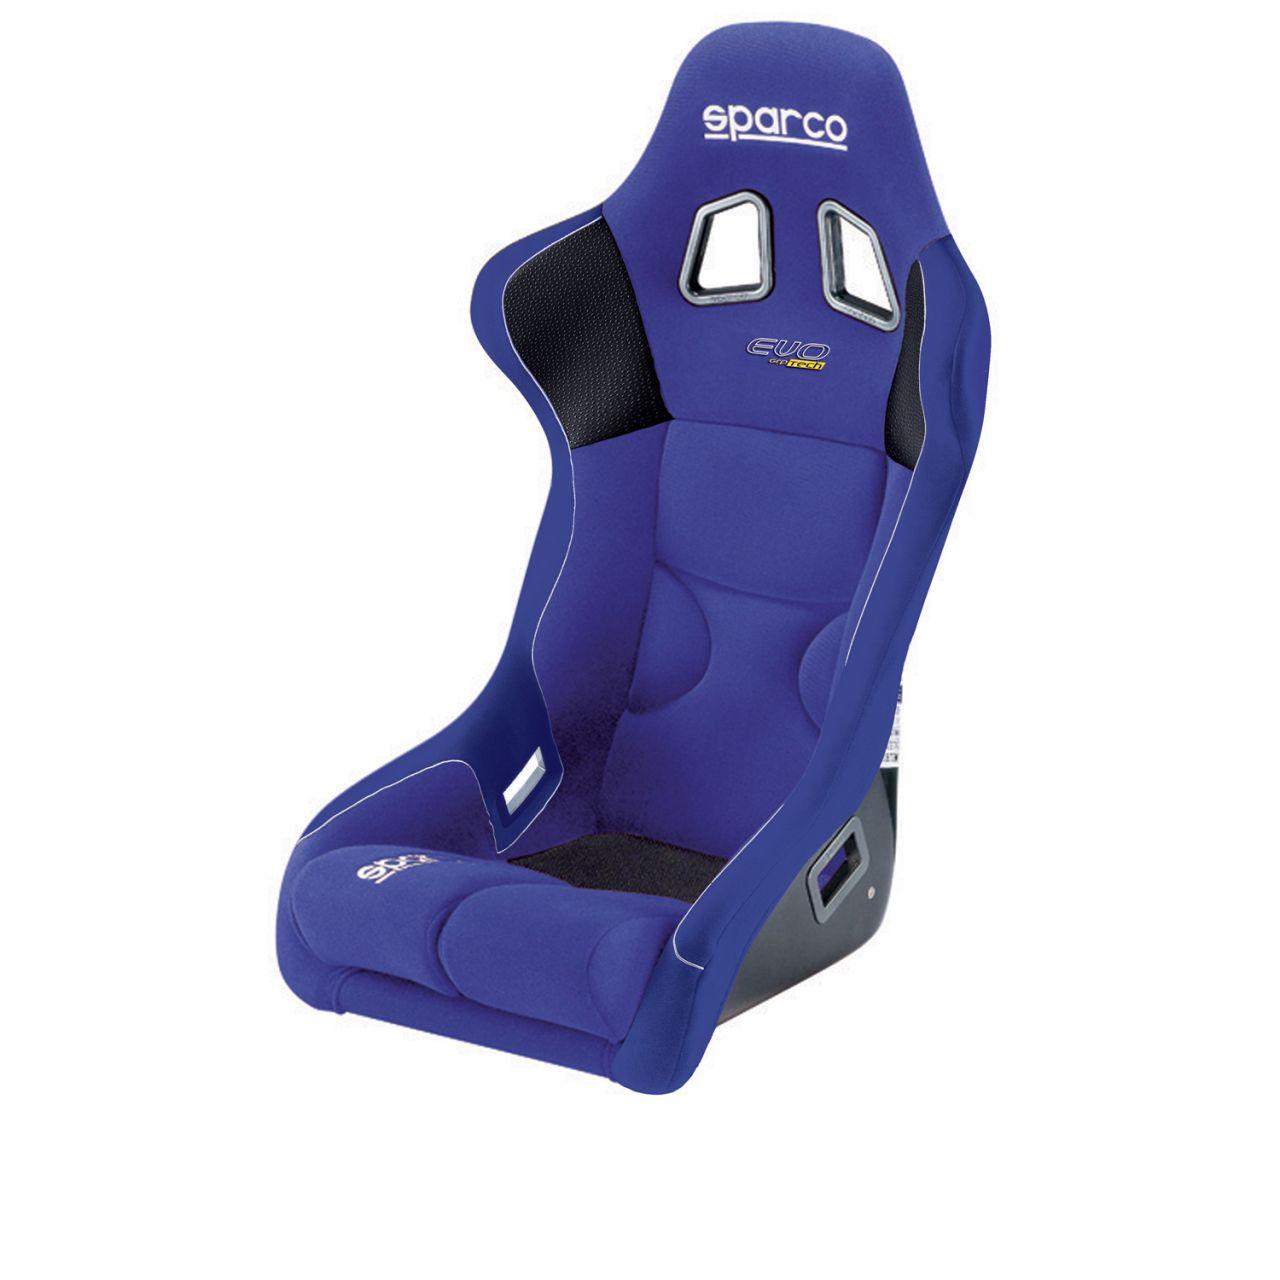 Sparco Evo Fia Motorsport Bucket Seat Gsm Sport Seats